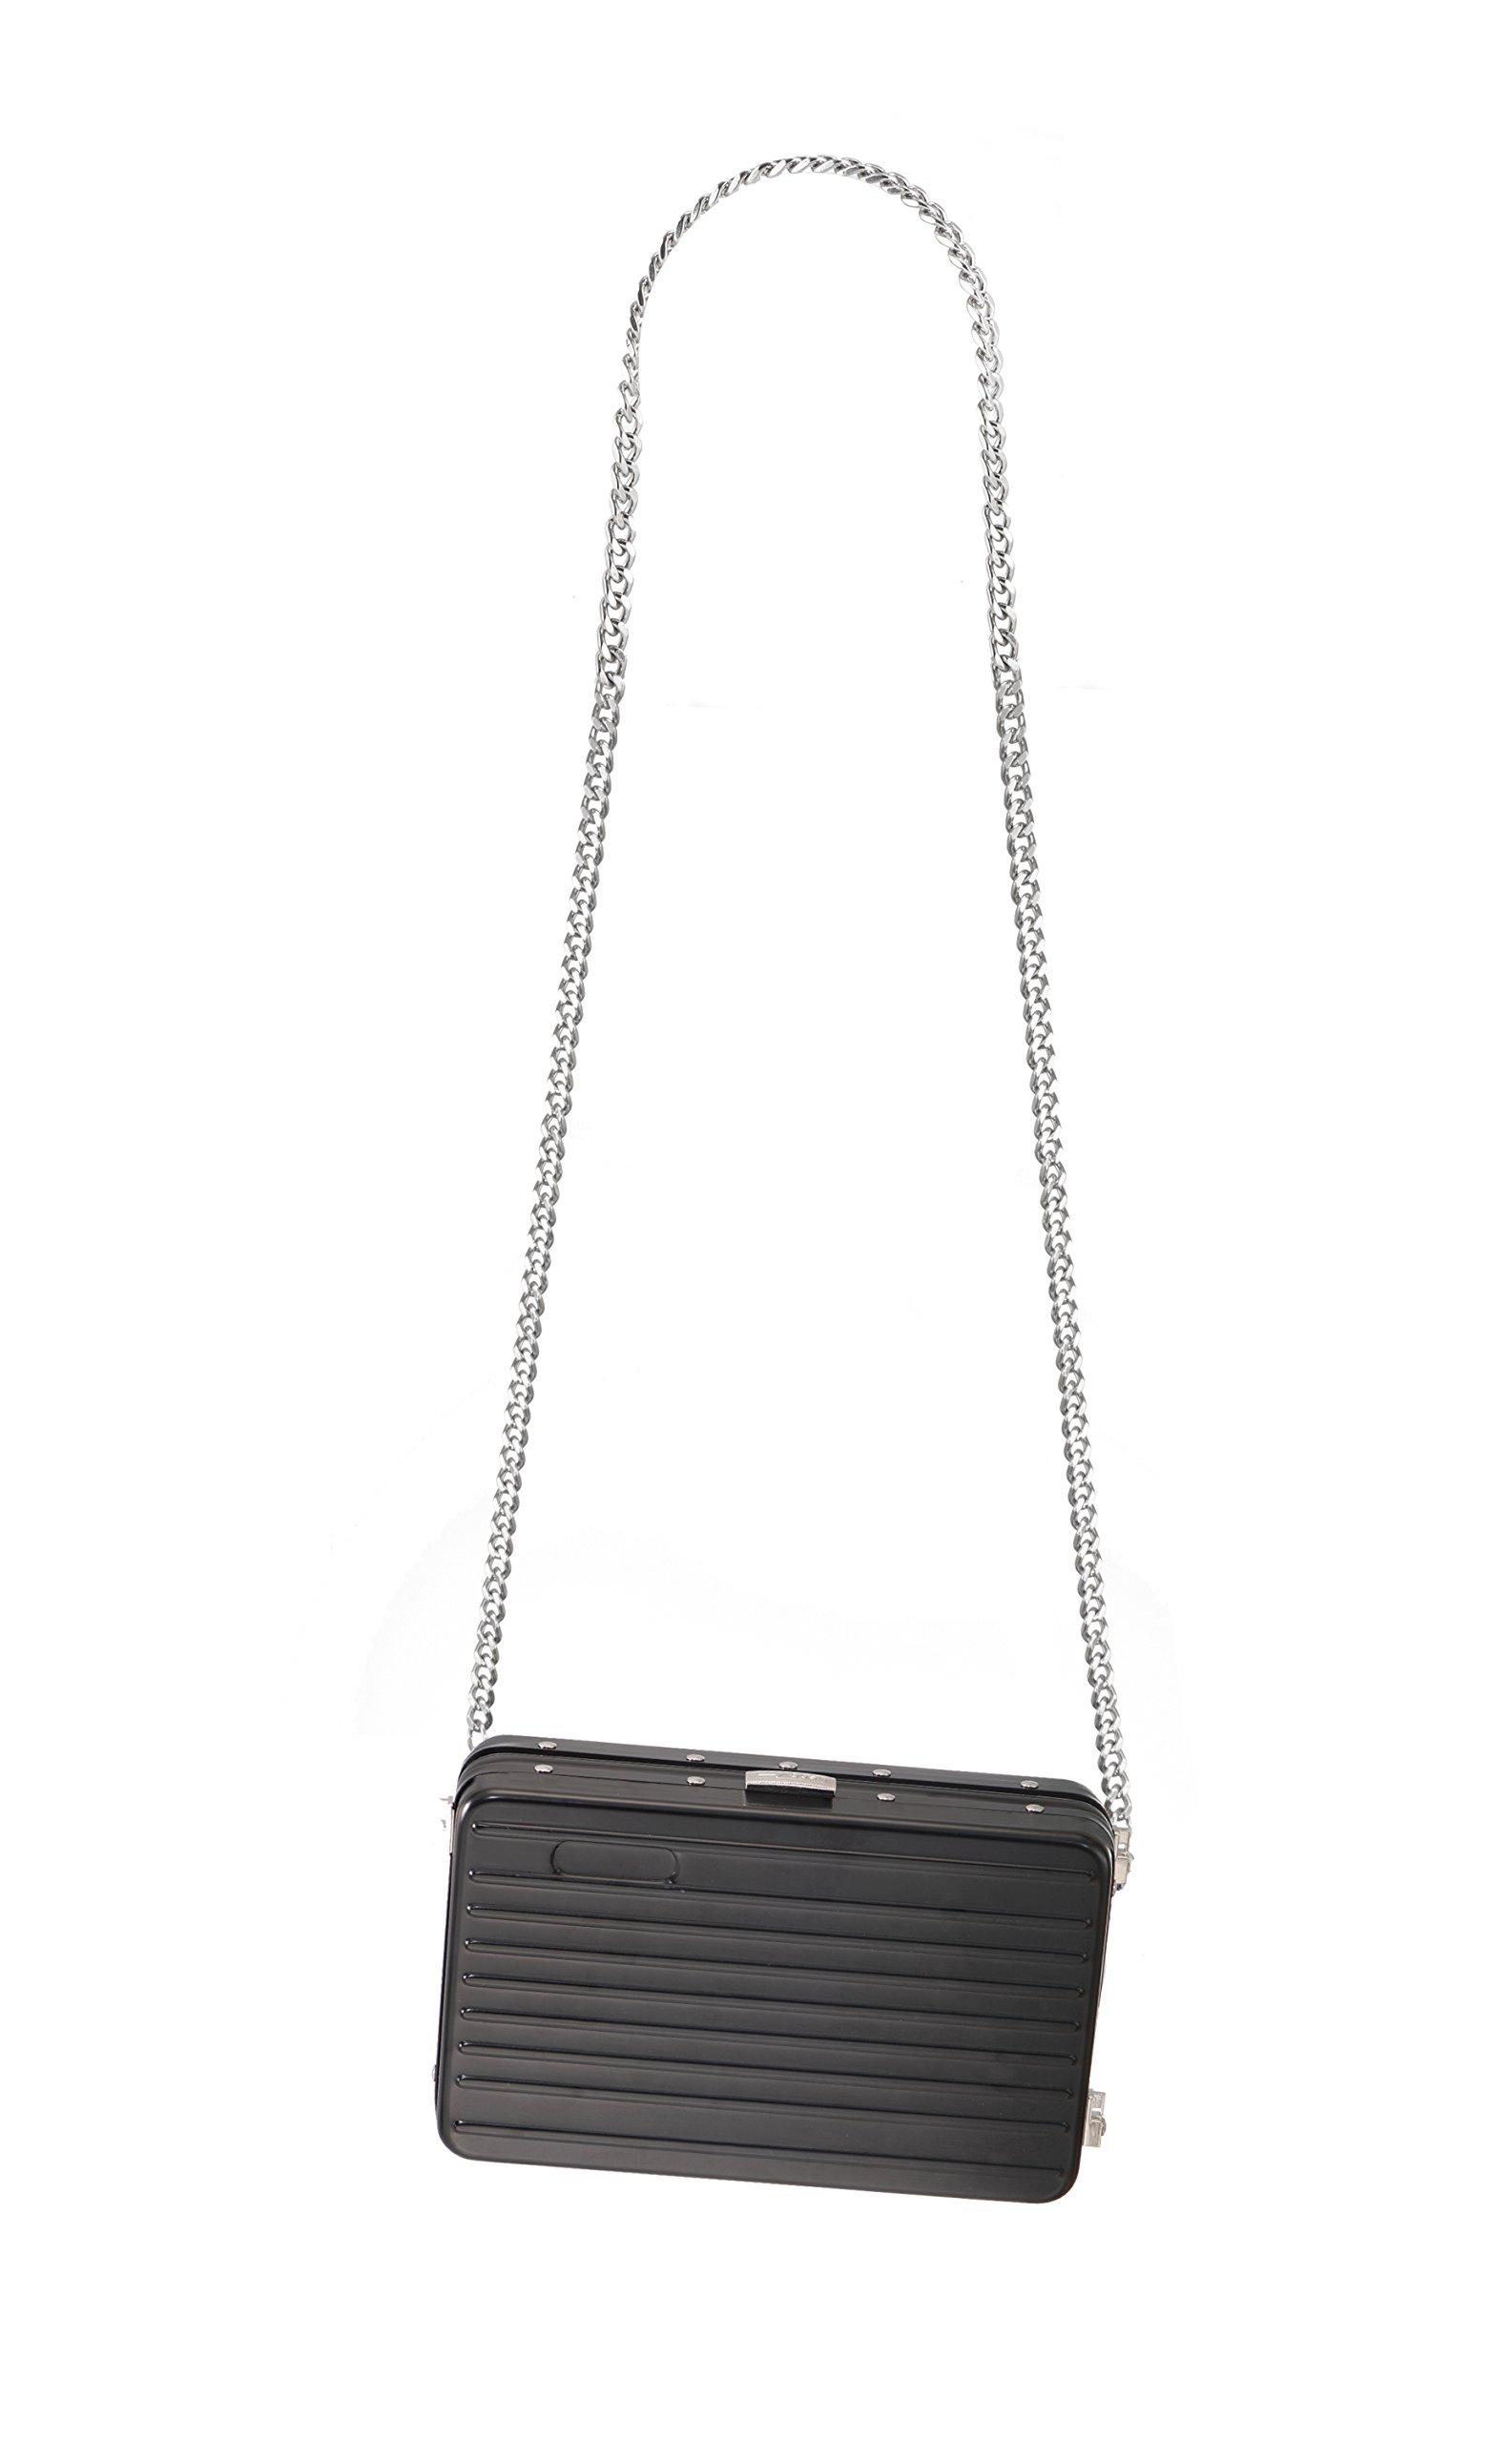 CHUWIT Crossbody Bags For Women Evening Bag Handbag Envelope Bag Shoulder Bag For Party Wedding